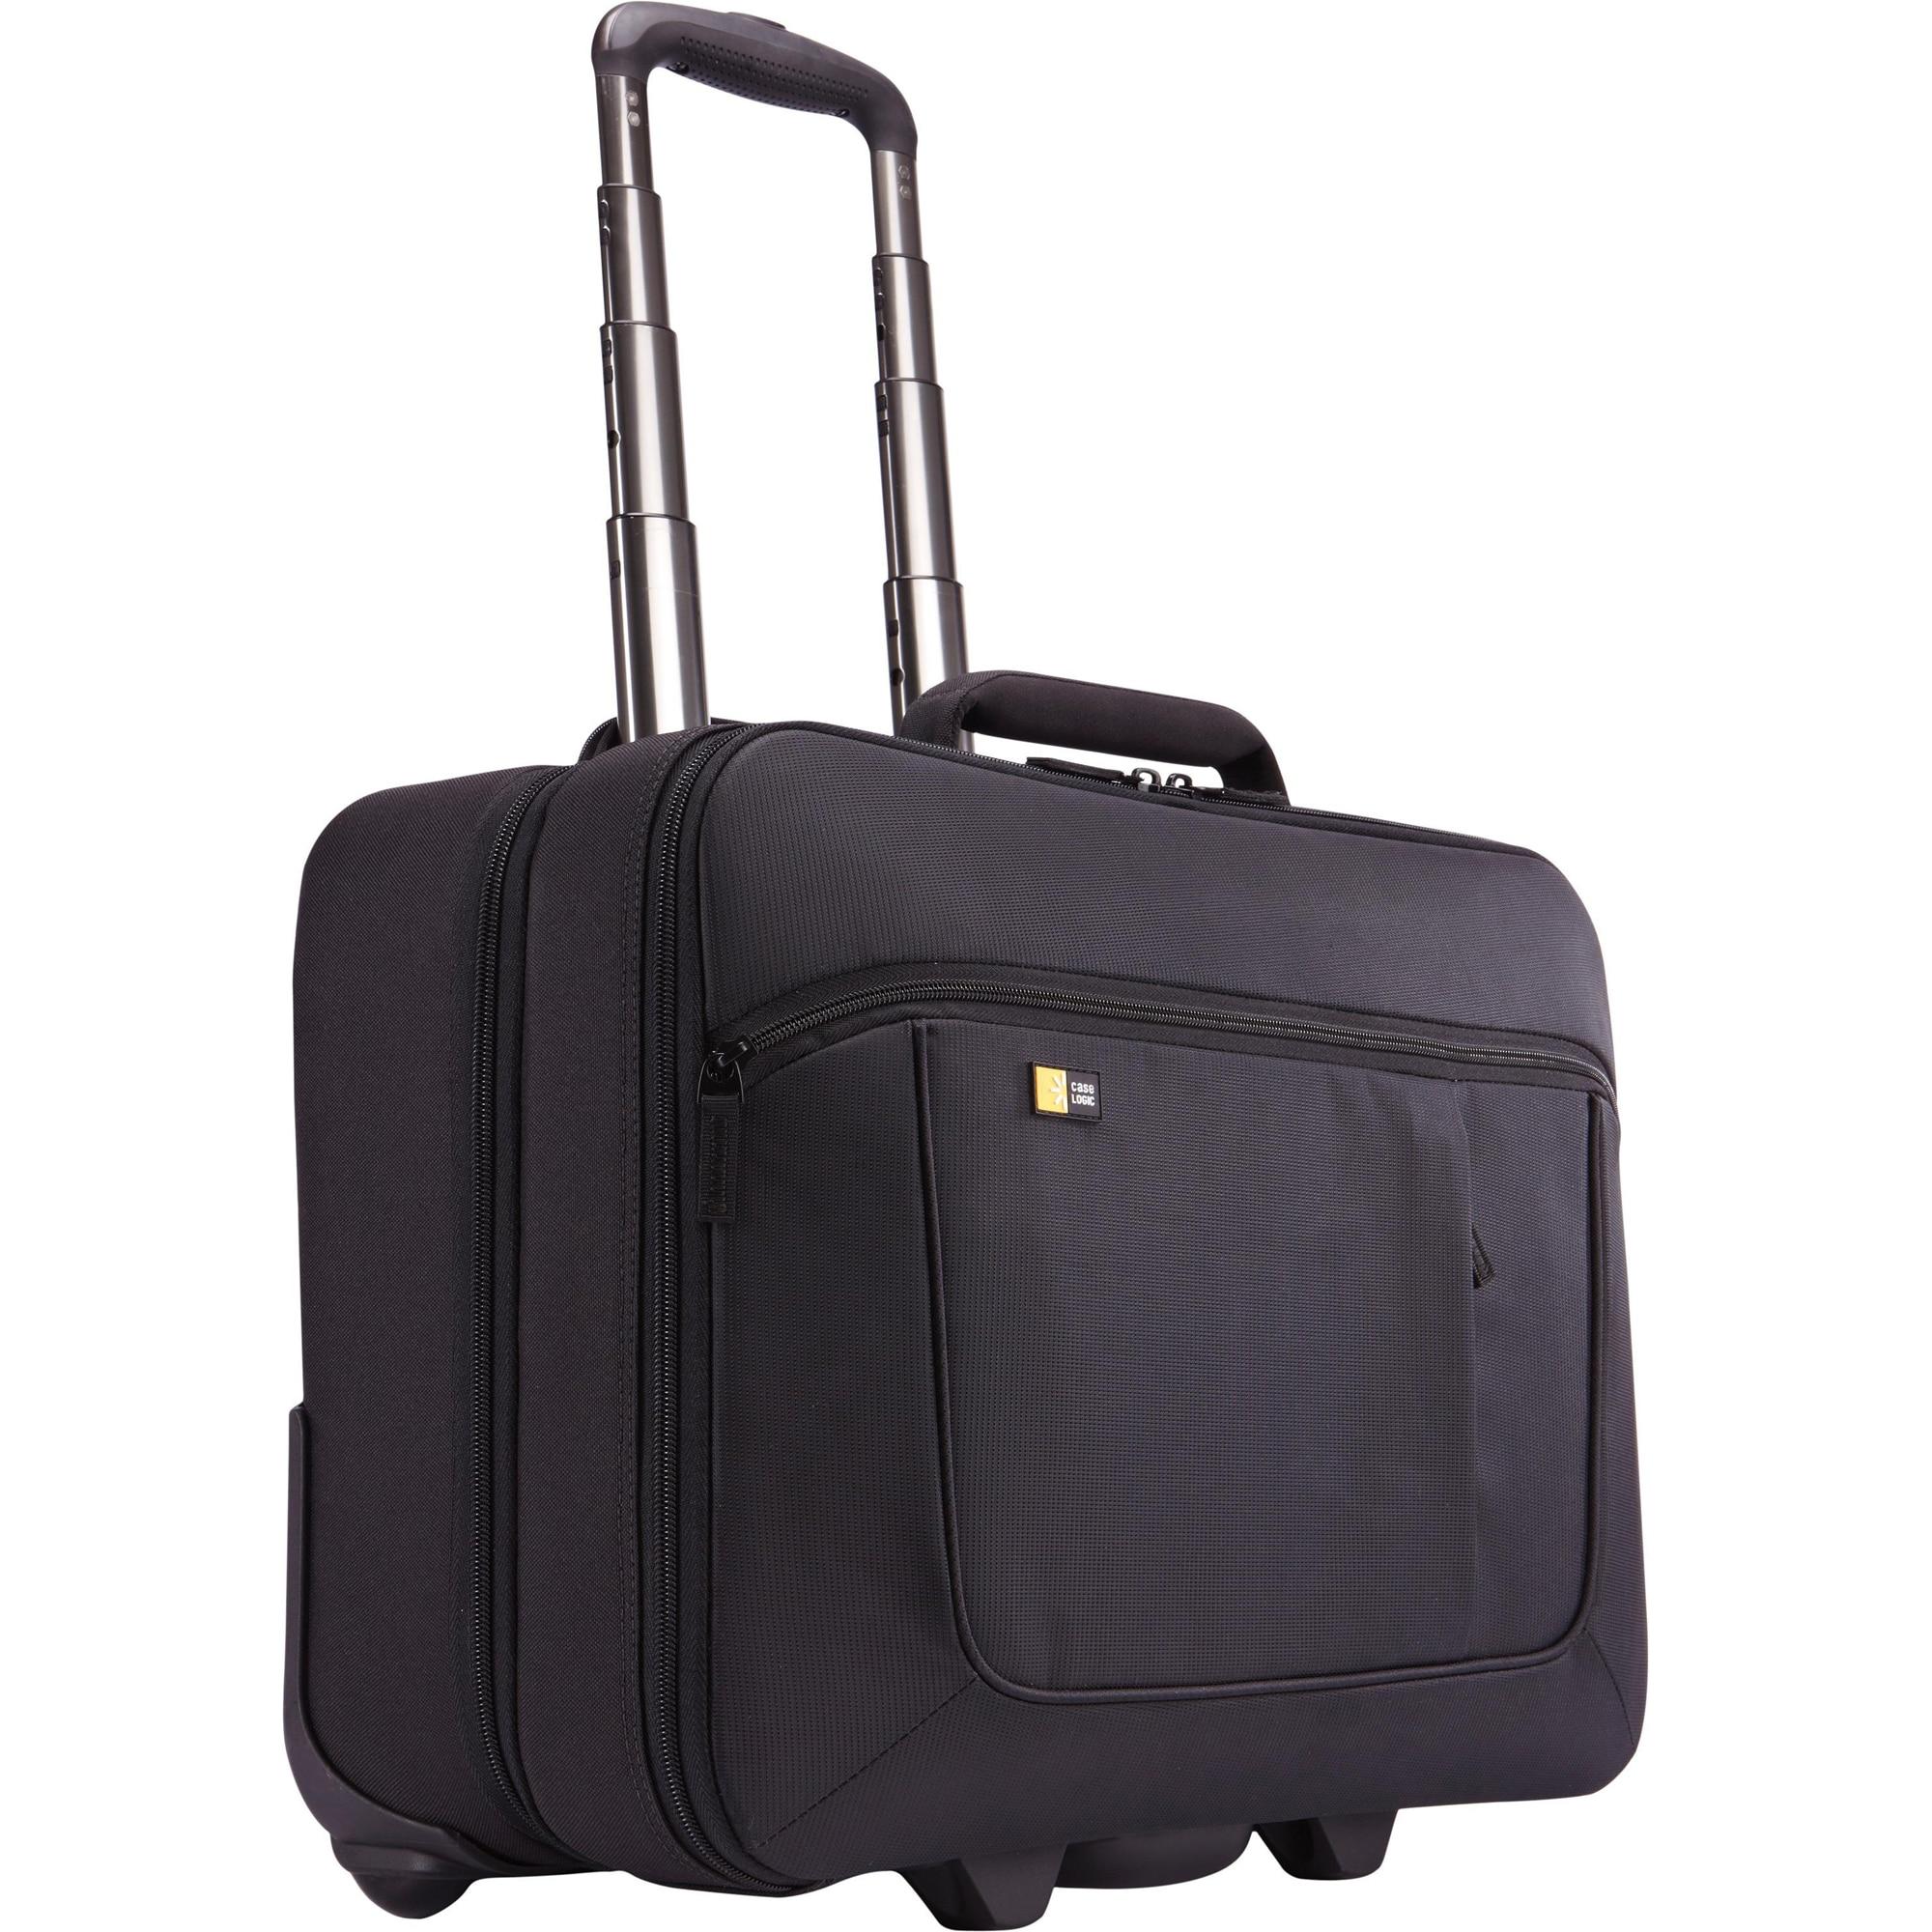 "Fotografie Troller Laptop Case Logic, 17.3"", Black"